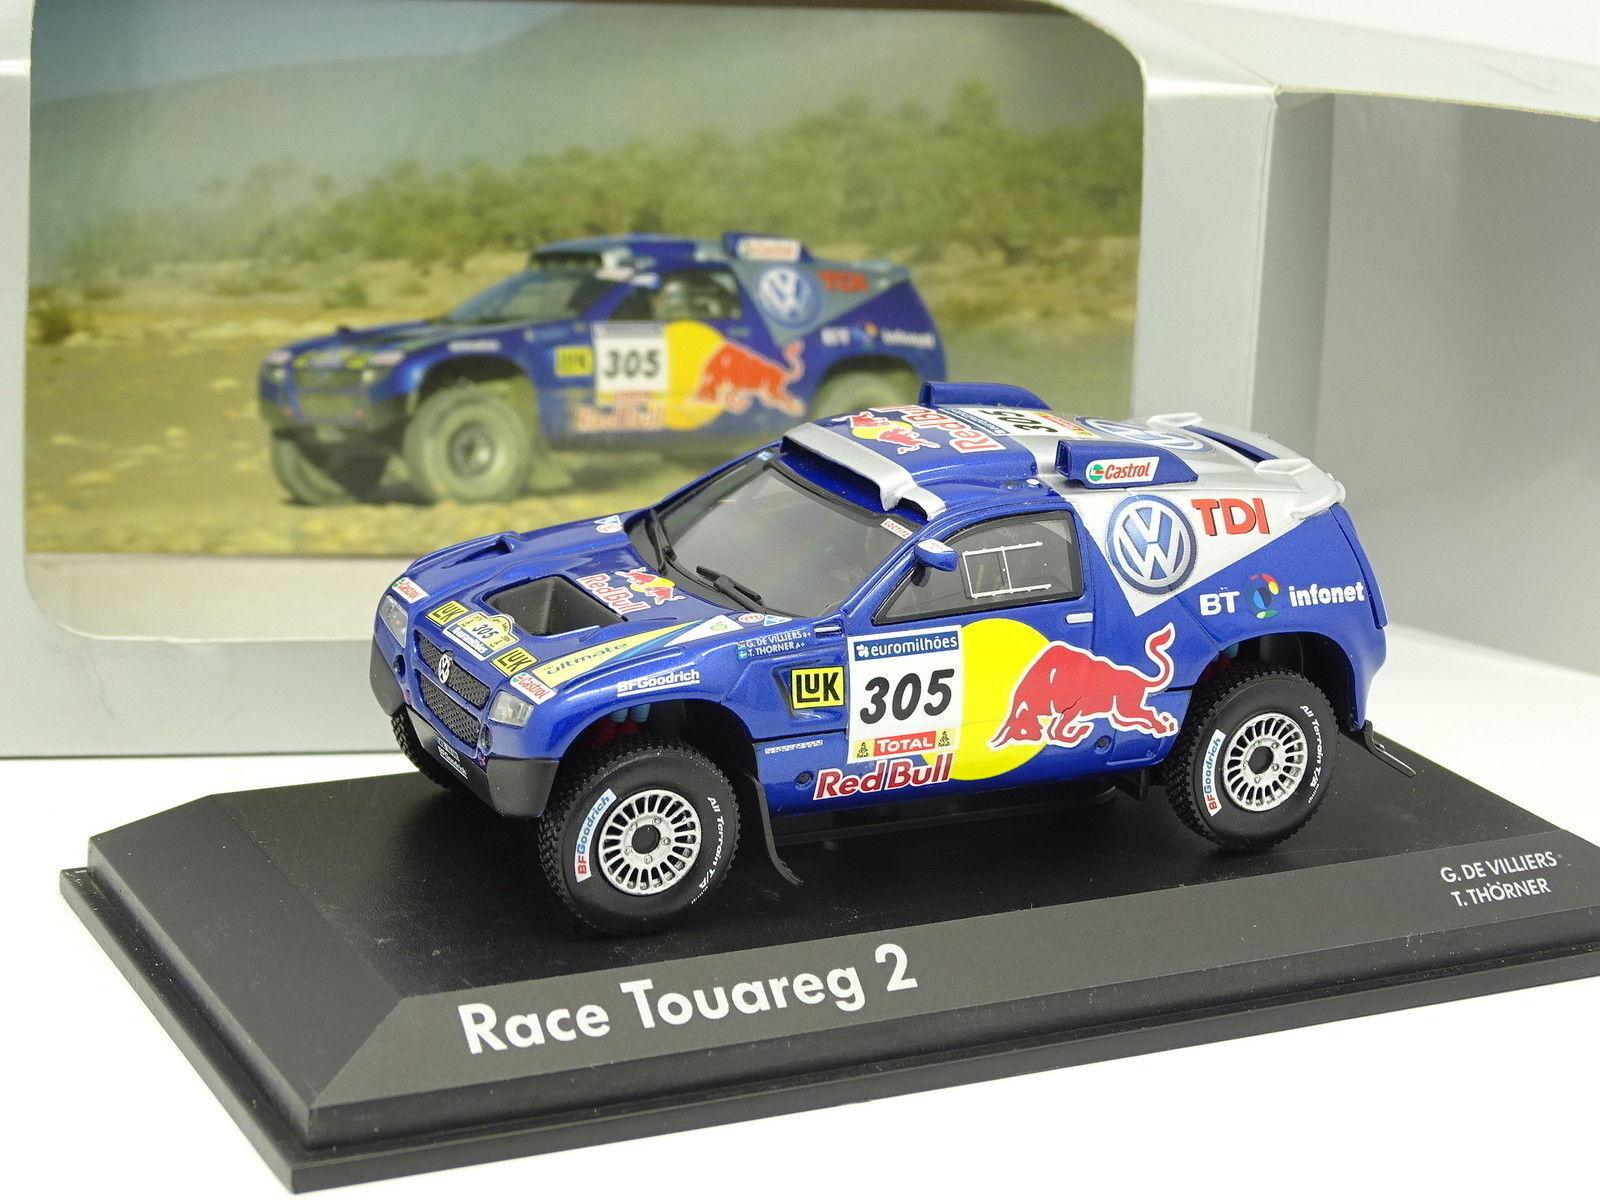 Norev 1 43 - VW Race touareg 2 Dakar 2006